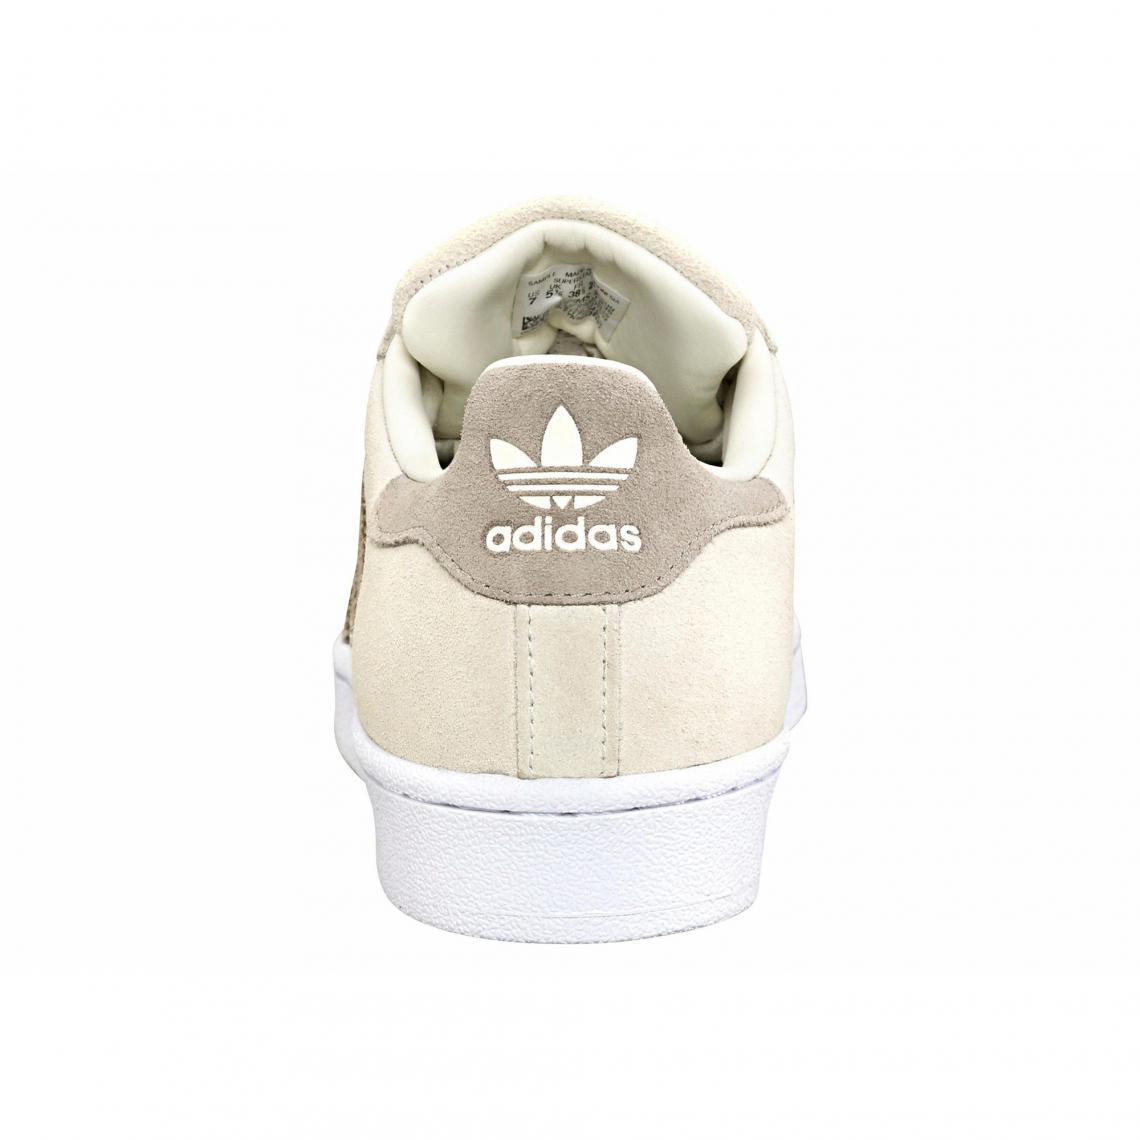 Pour Adidas De Chaussures Sport W Originals Superstar Sneaker Femme WE9D2HI